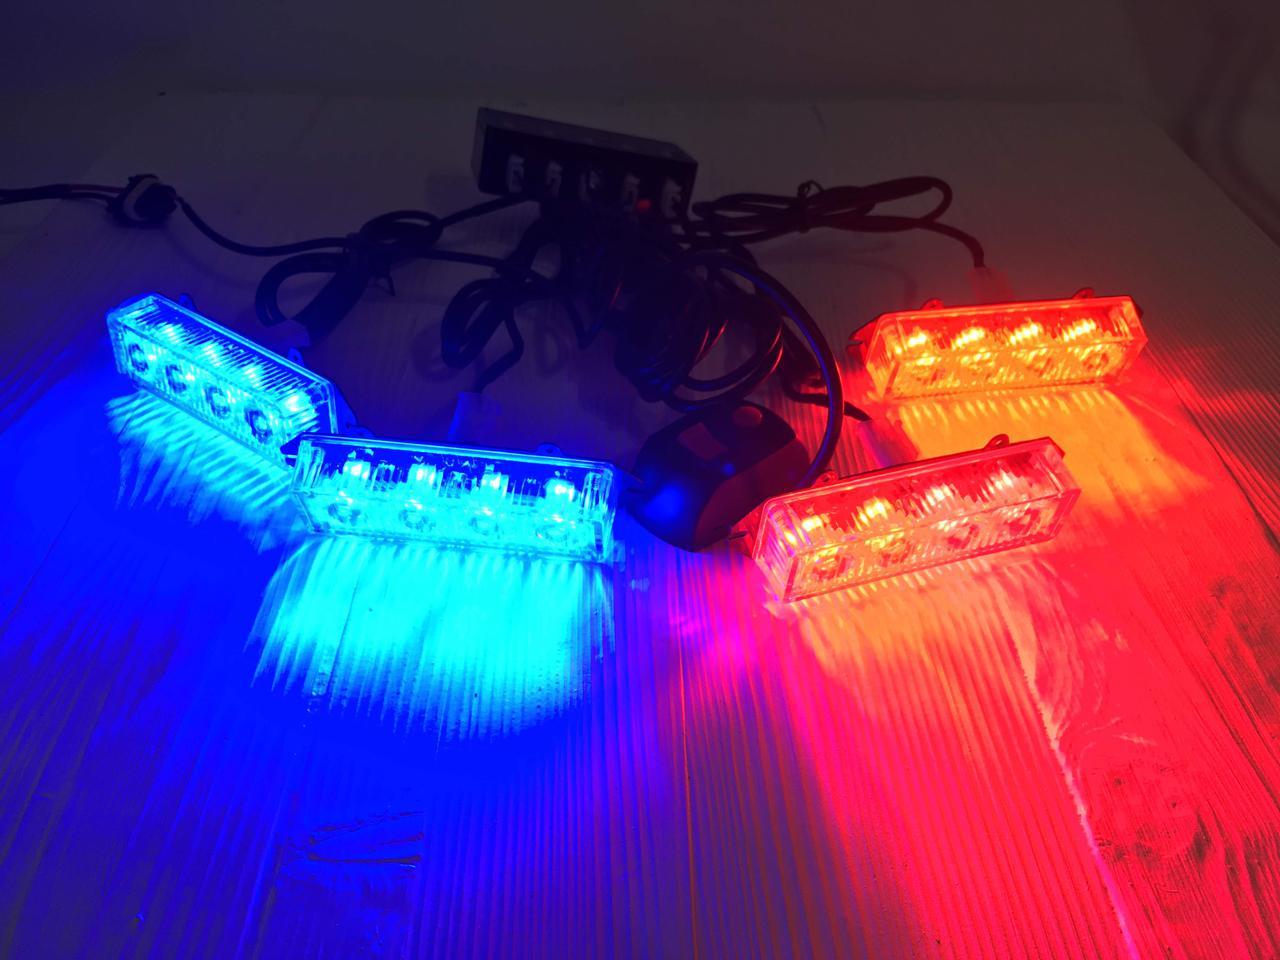 Стробоскоп LED 4-2-16 красно-синий или синий 12 Вольт